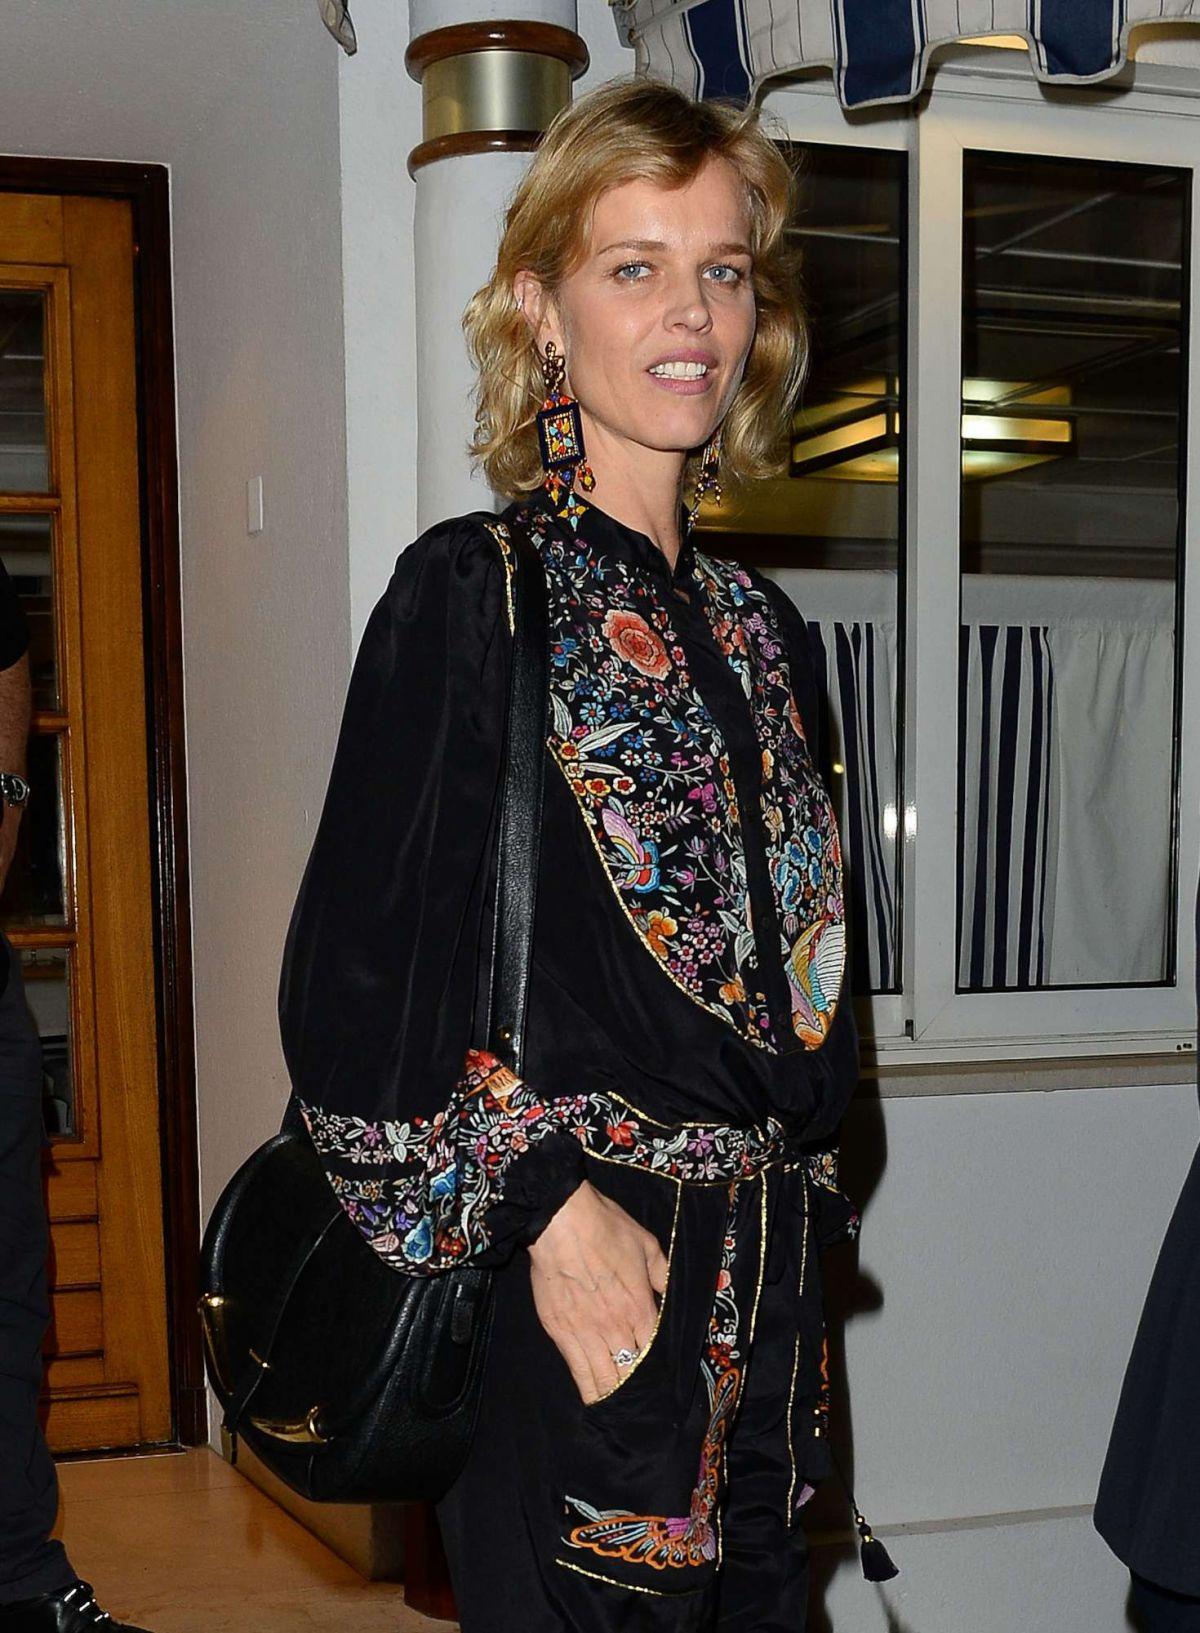 EVA HERZIGOVA Out for Dinner at Tetou Restaurant in Cannes 05/16/2017